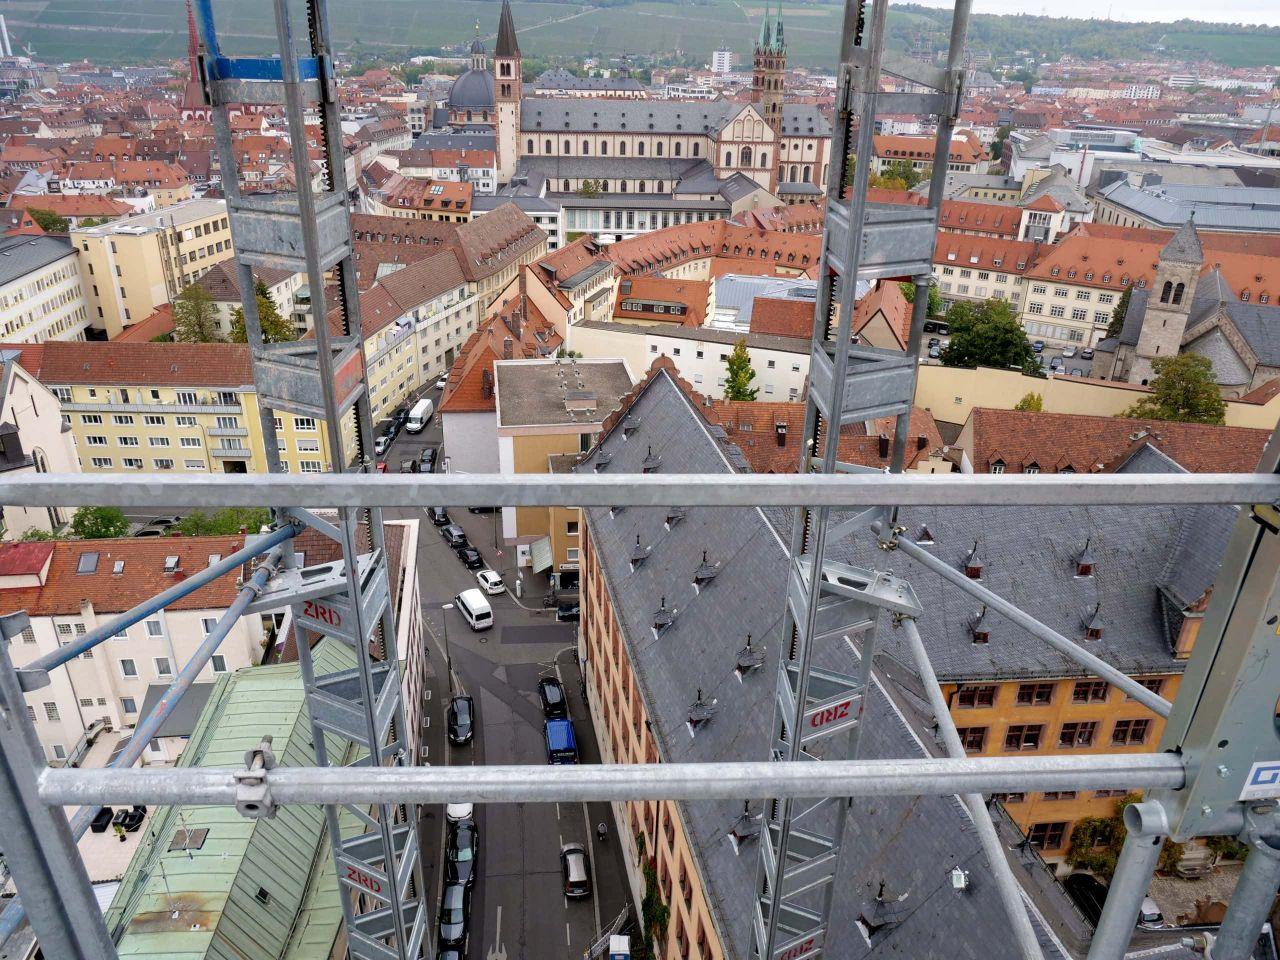 Neubaukirche Baustelle